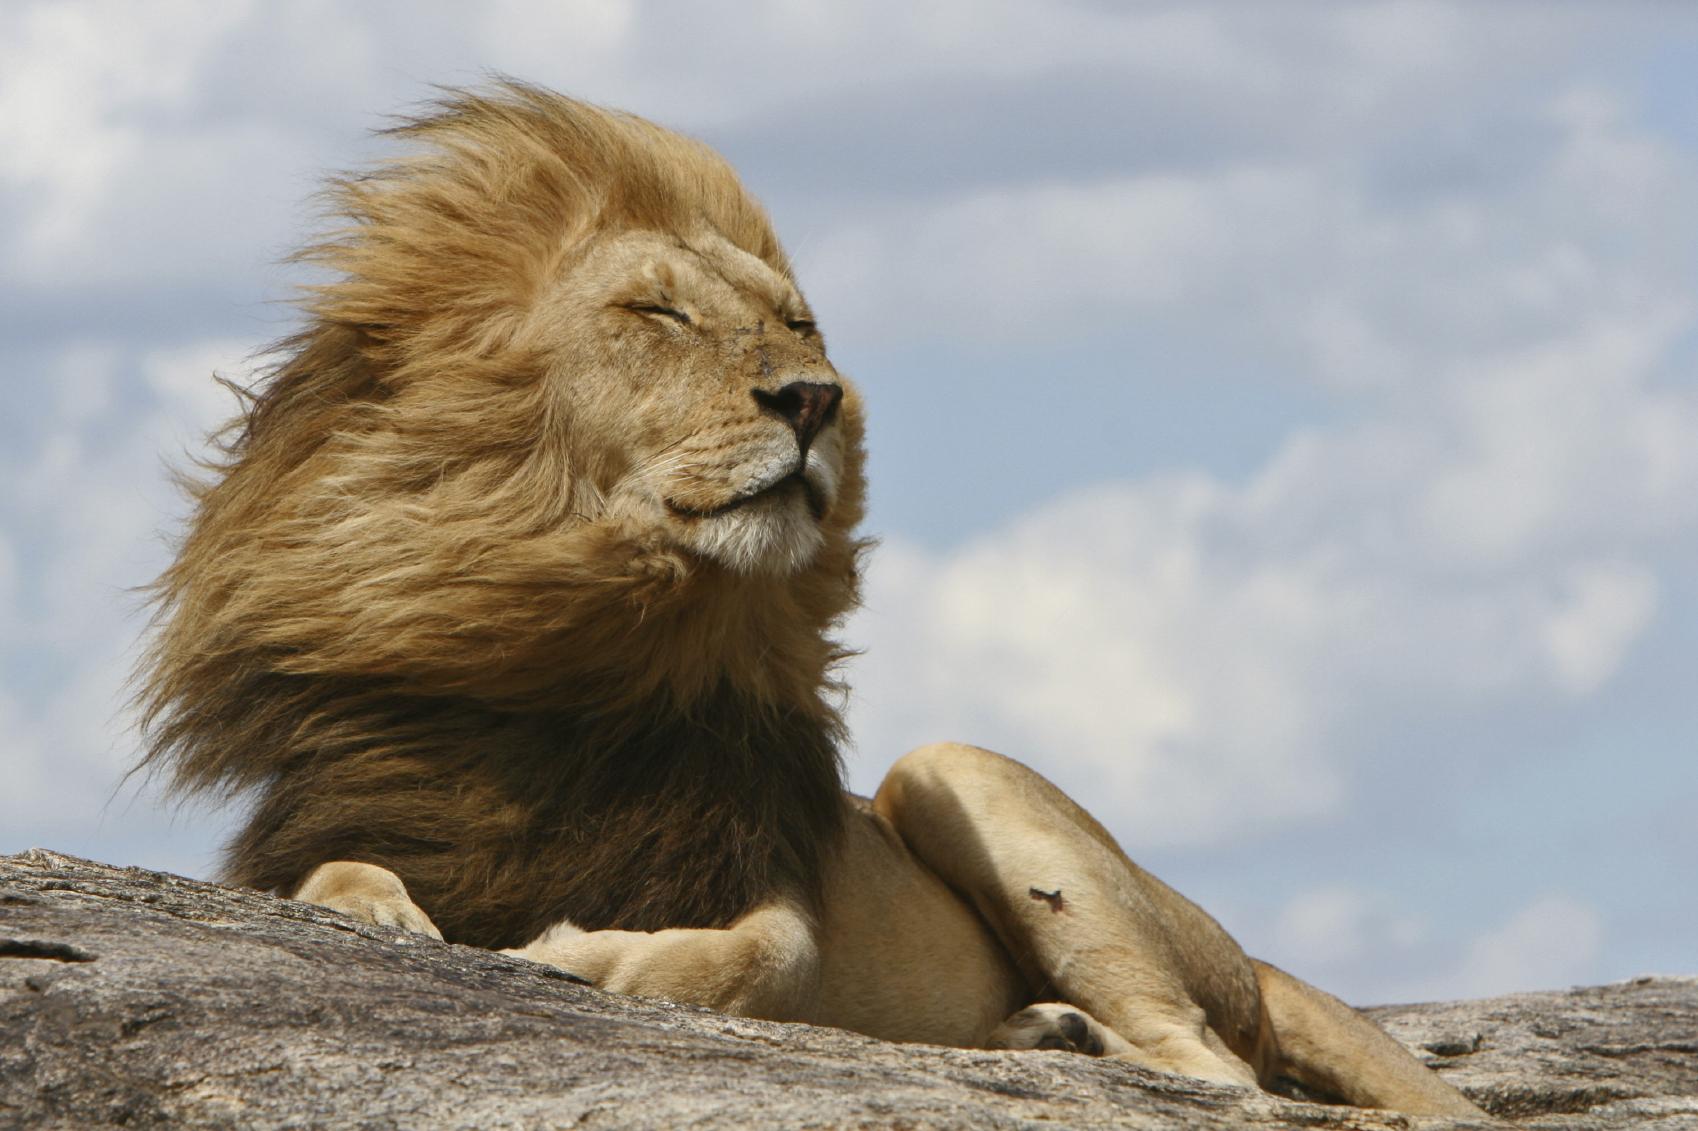 Tanzania Adventure Safari - Tanzania Tours - Kensington Tours - Viajes de lujo, privada Viaje Guiado